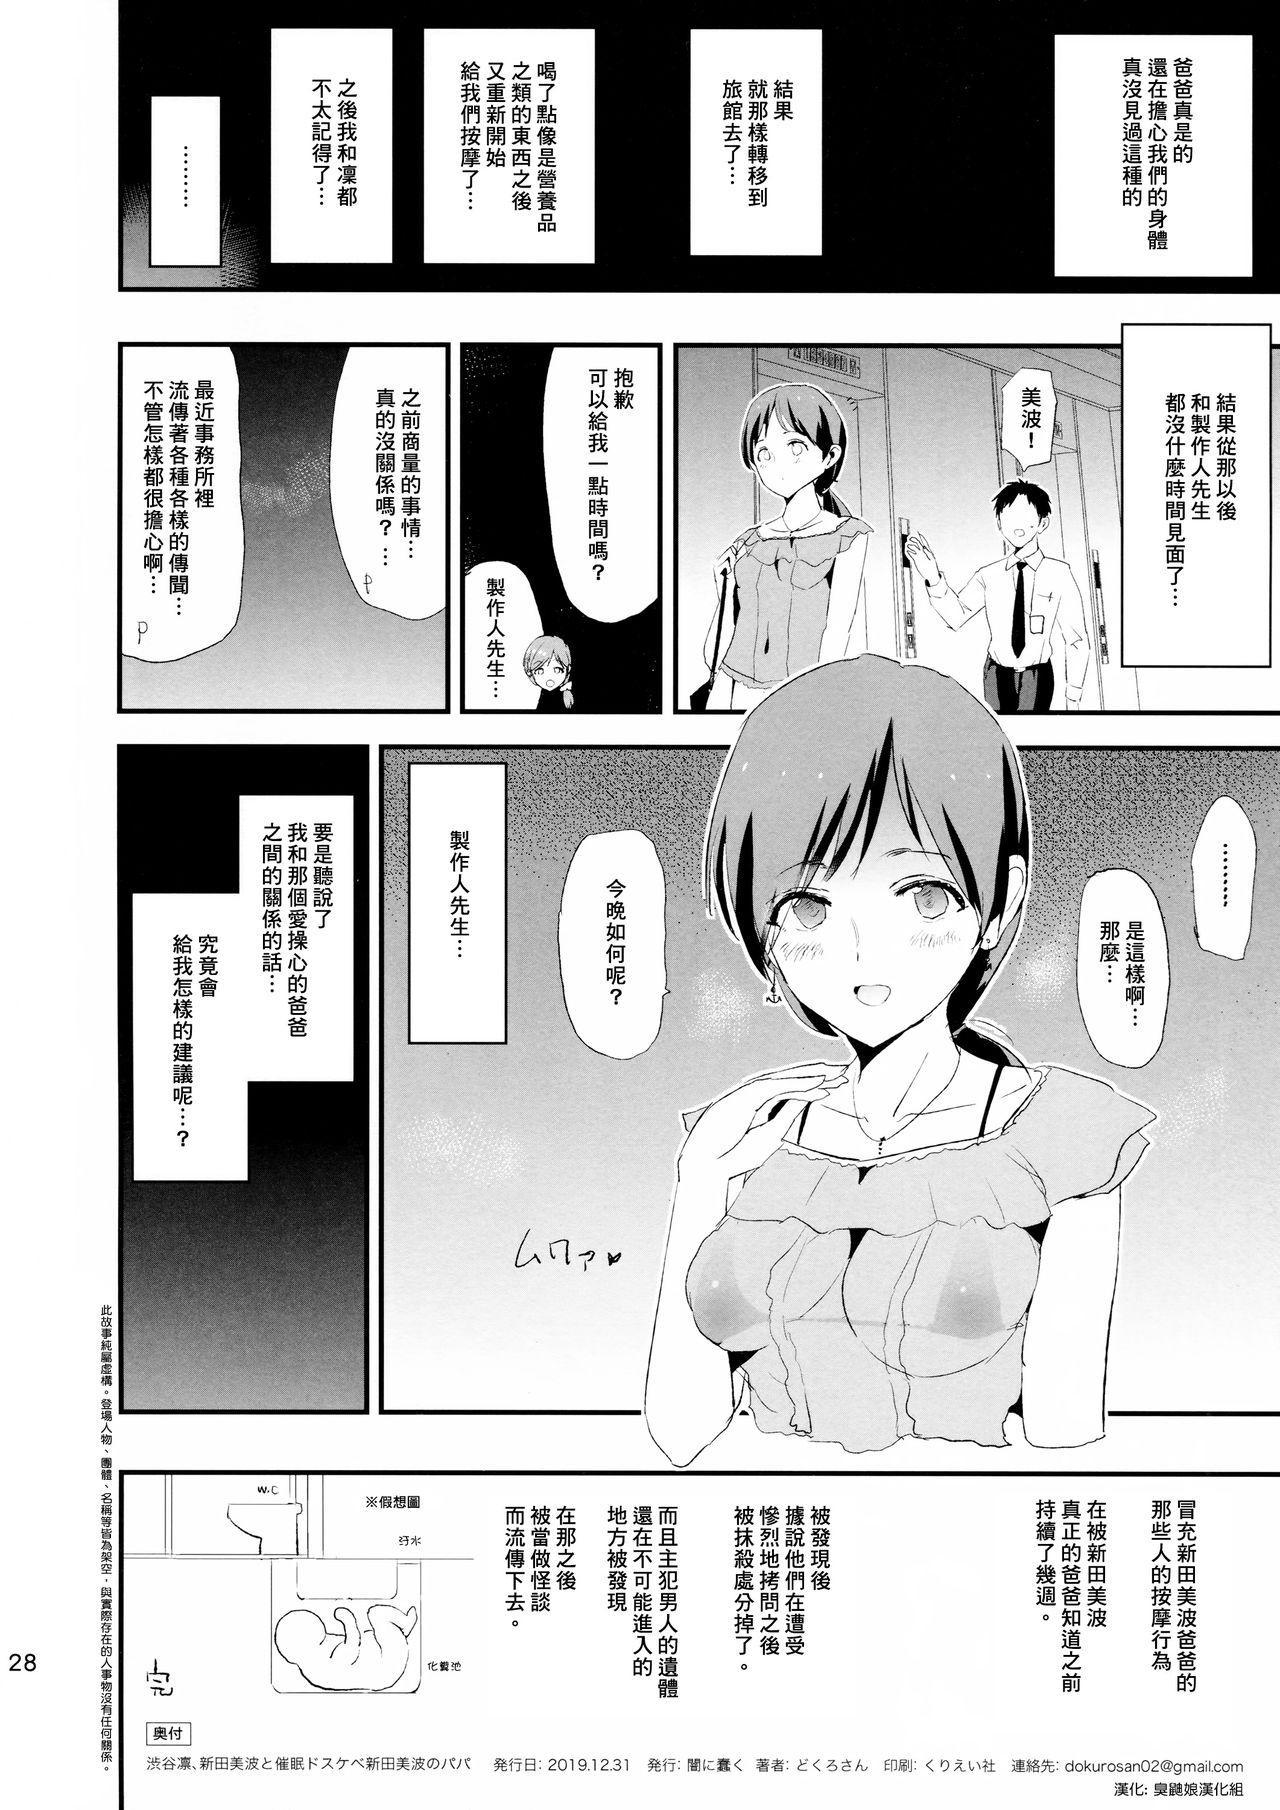 Shibuya Rin, Nitta Minami to Saimin - Dosukebe Nitta Minami no papa 27